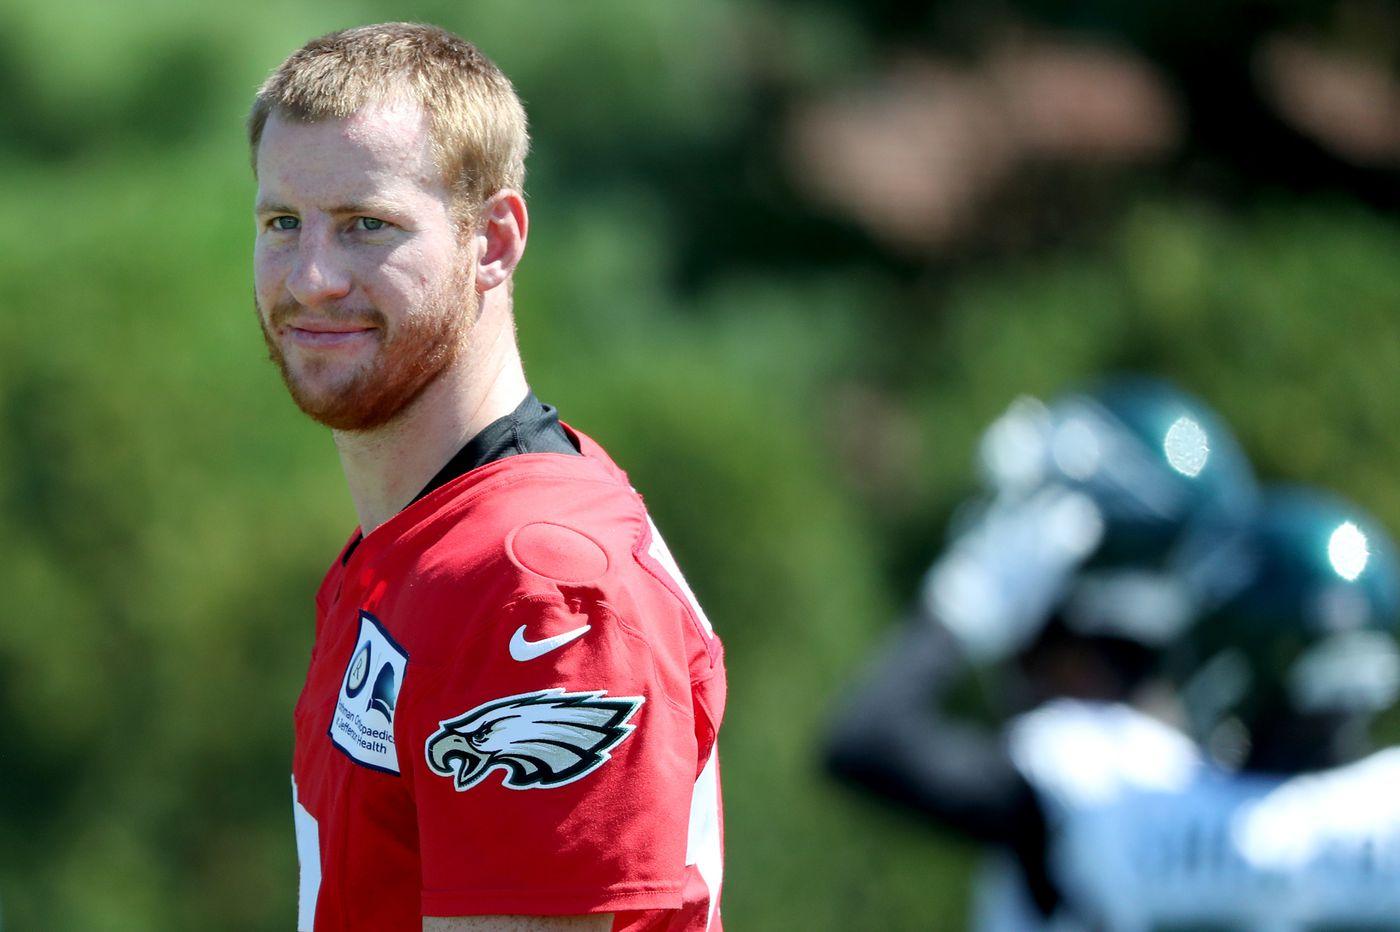 Not playing Eagles quarterback Carson Wentz in preseason is risky, too | Bob Ford